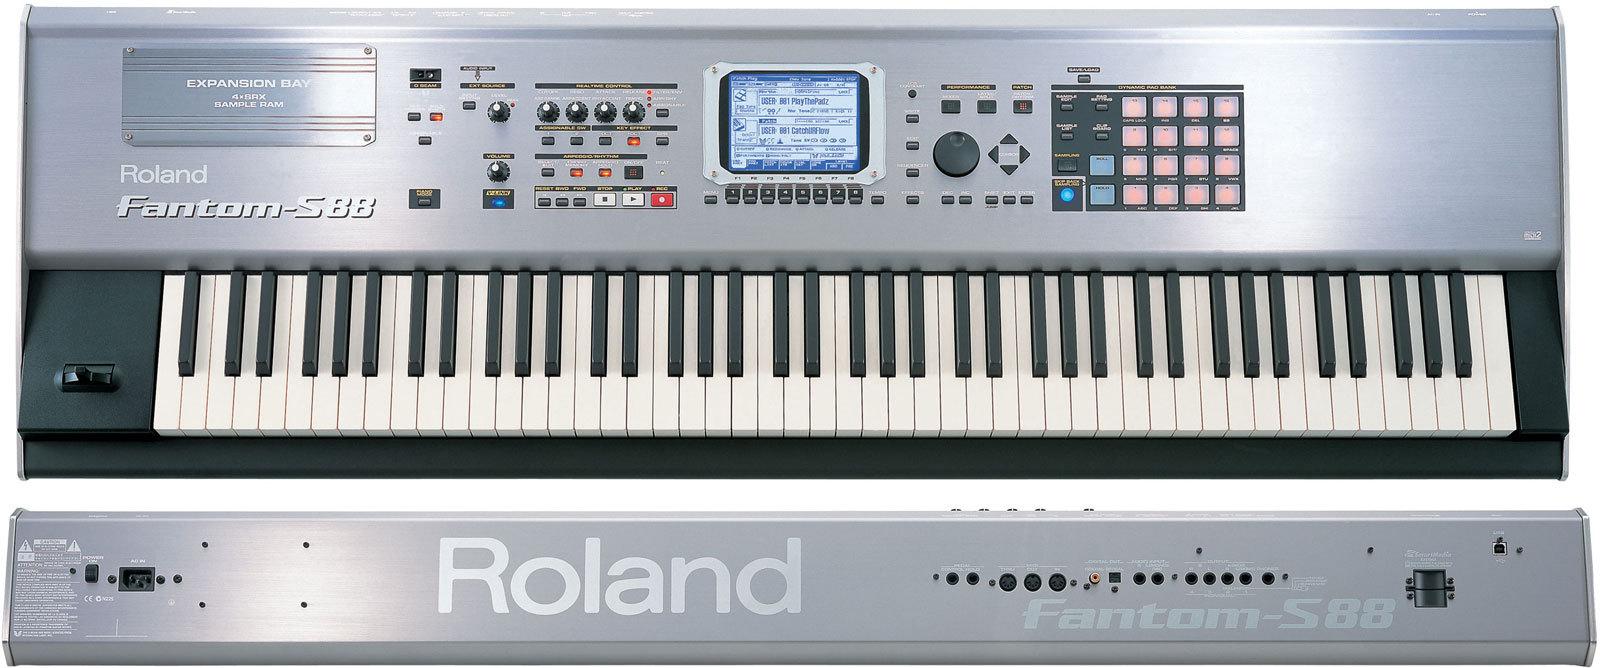 roland fantom s 88 image 67523 audiofanzine rh en audiofanzine com roland fantom s service manual manual roland fantom s español